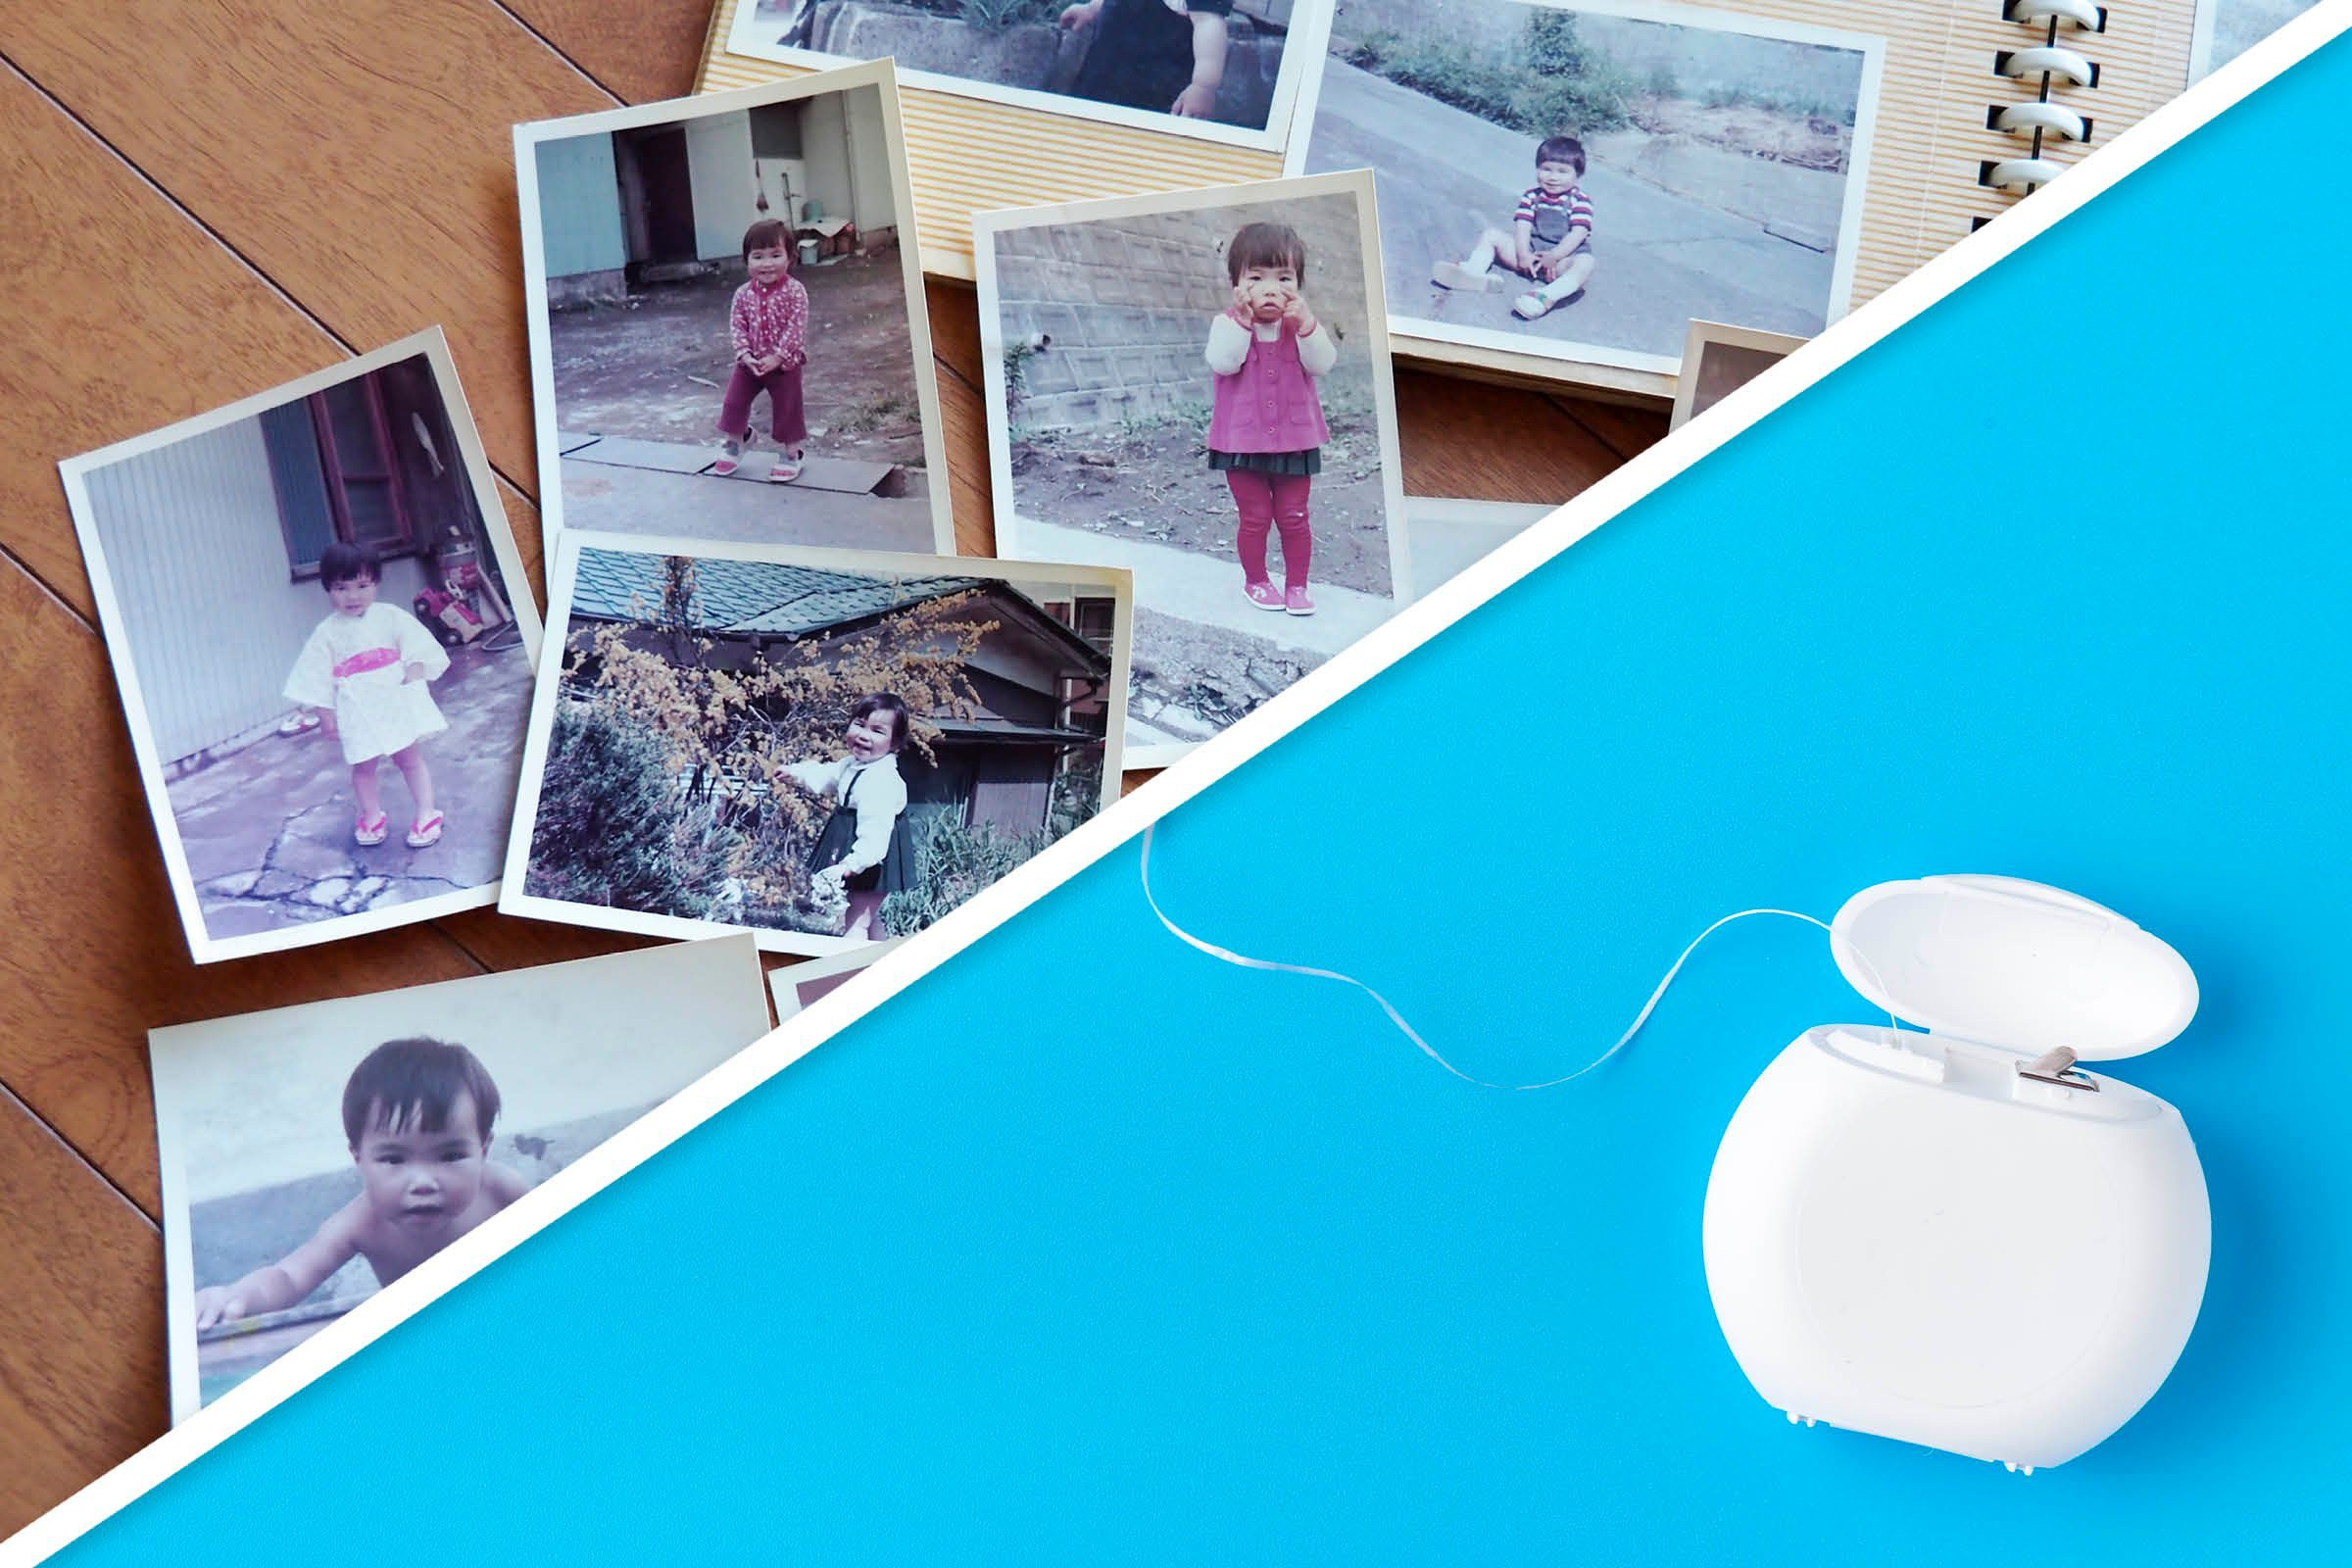 Family photo album and floss